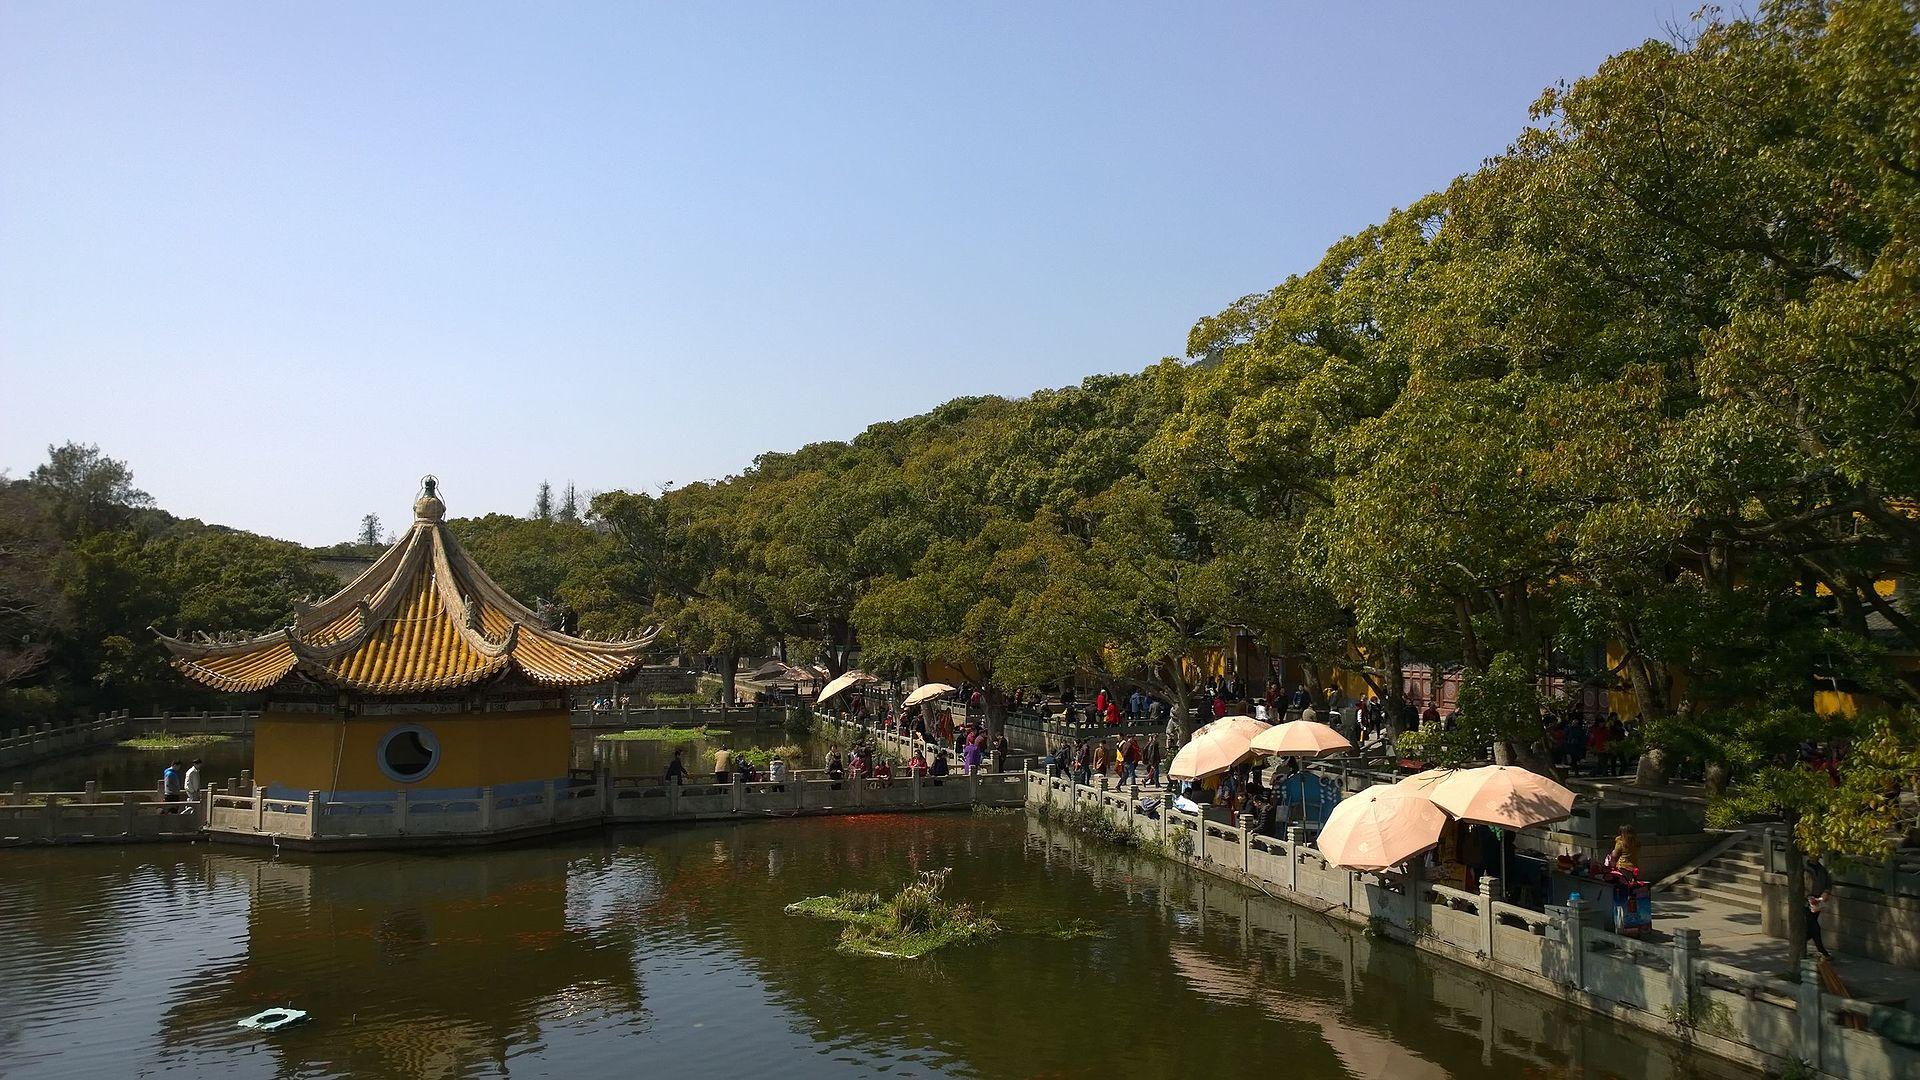 Lake_at_Puji_Temple_4.jpg